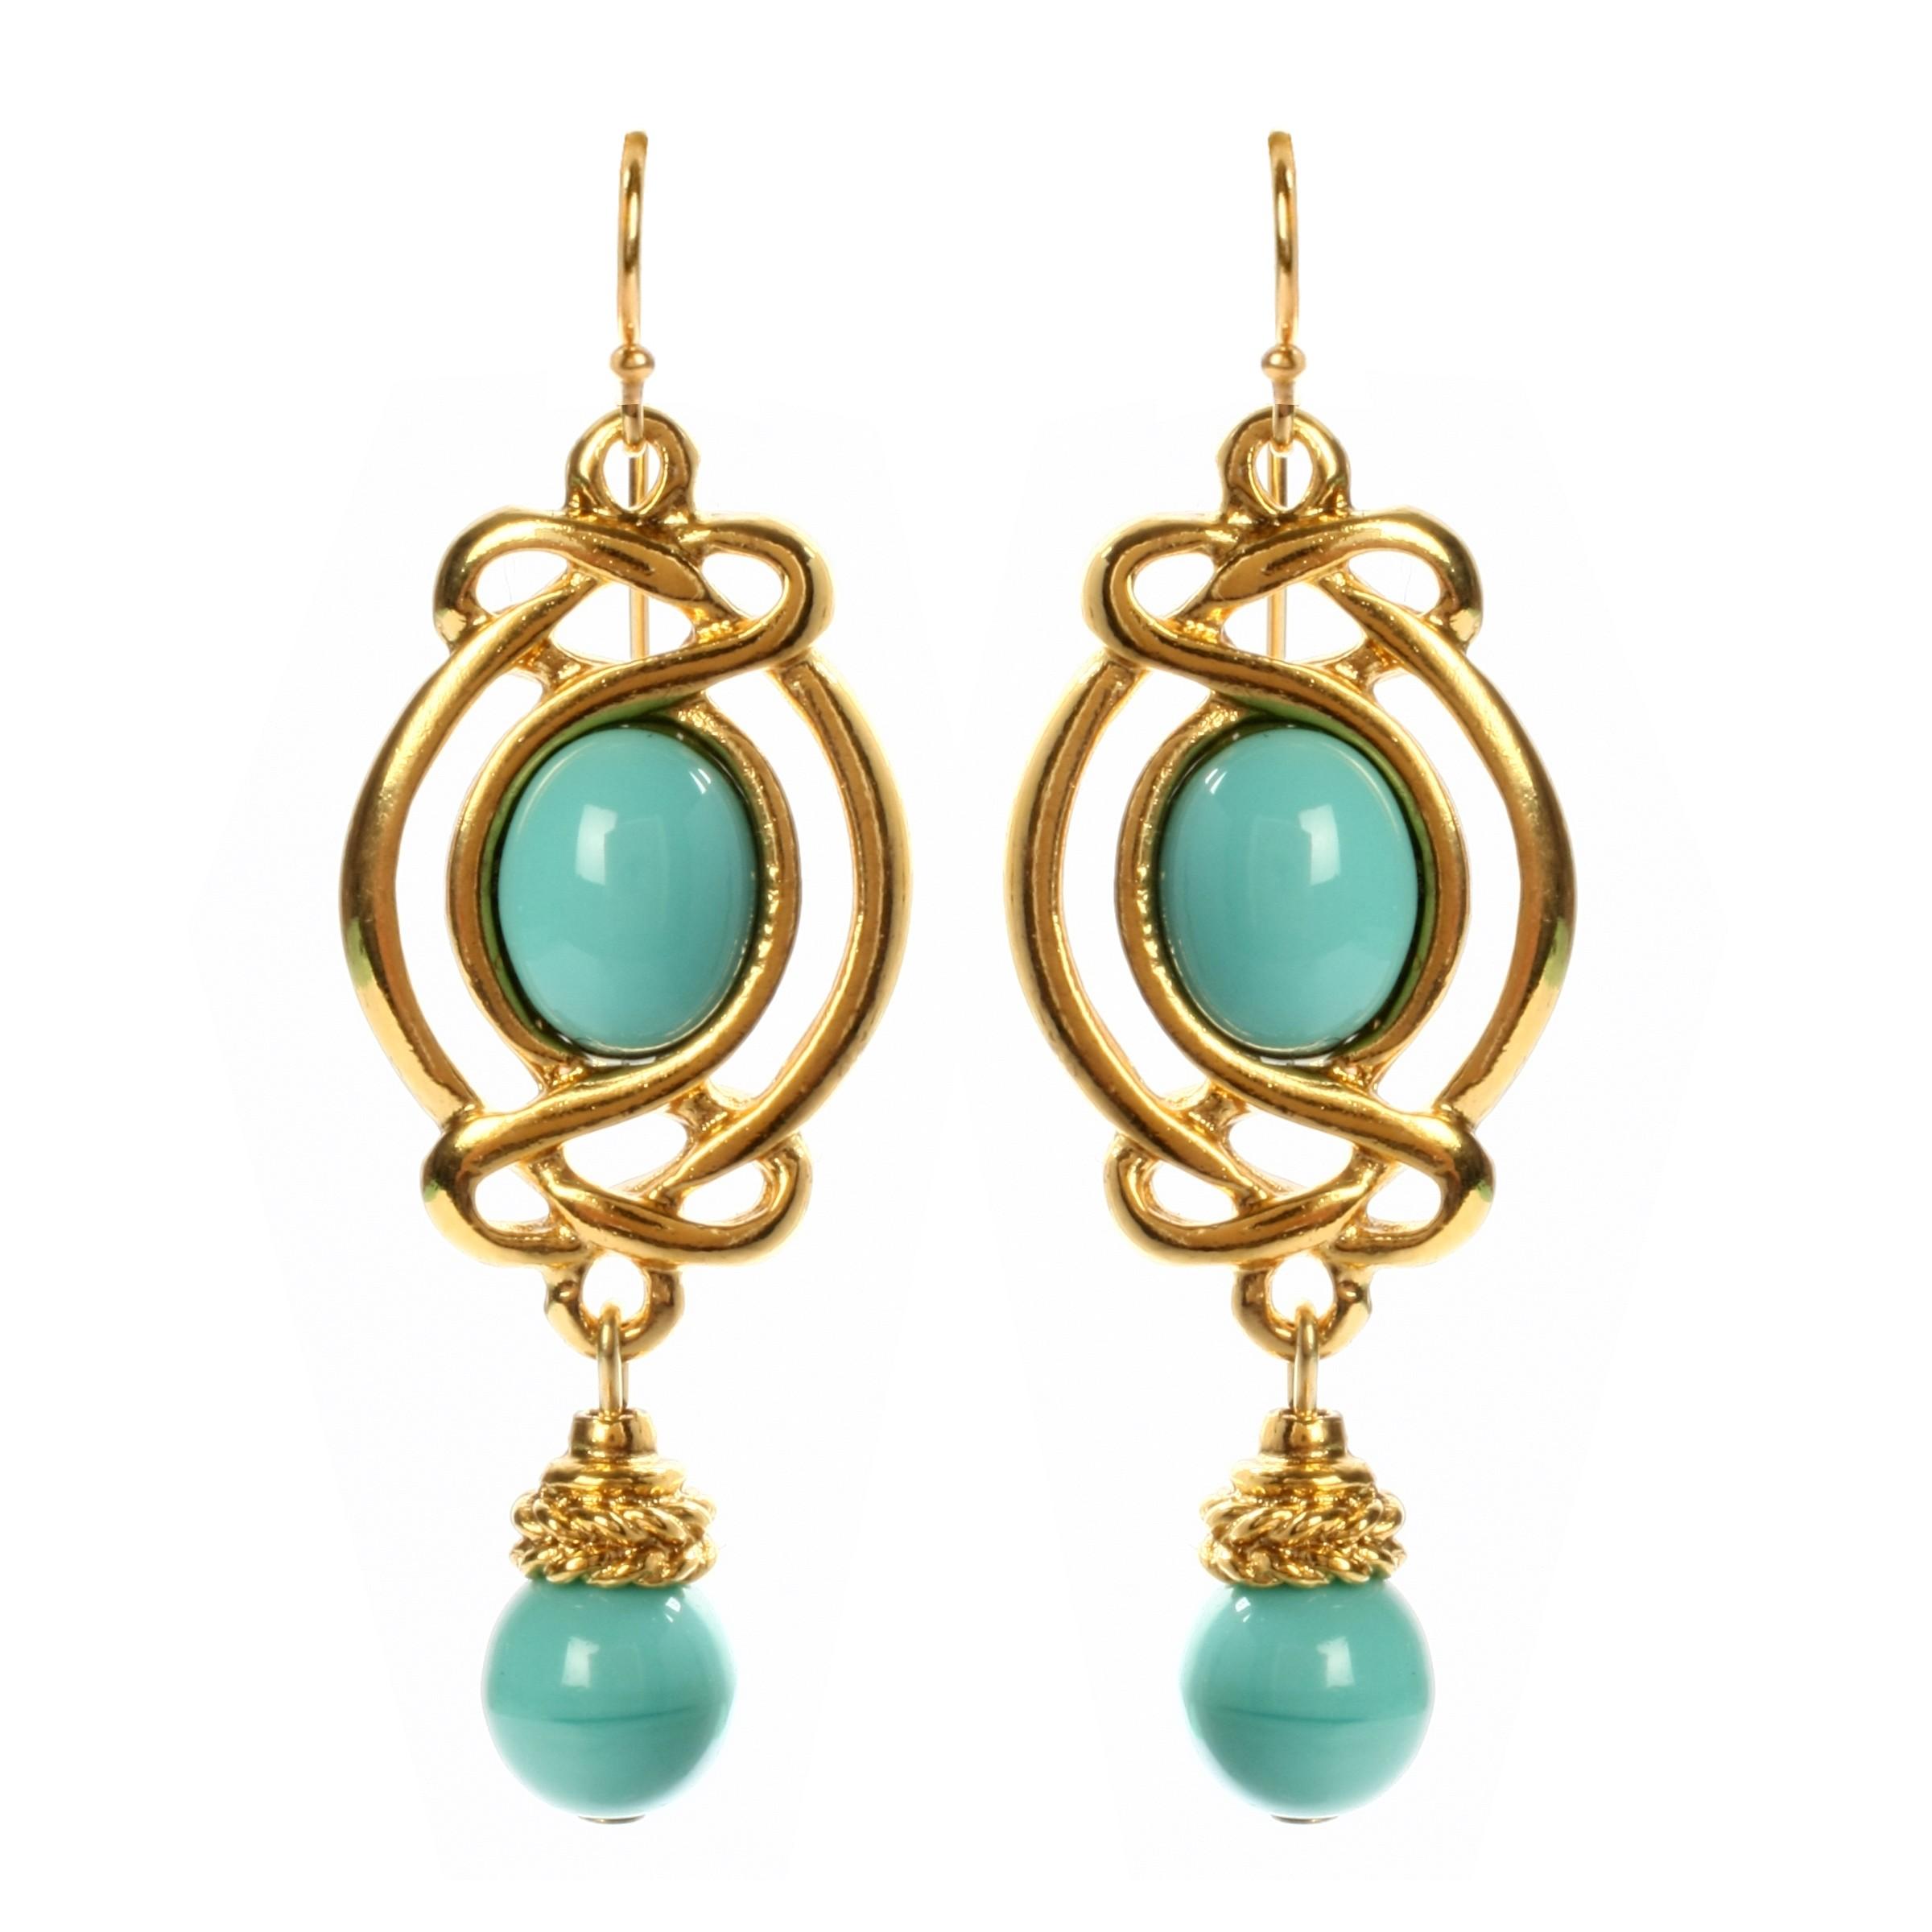 Ben Amun Vintage Inspired Turquoise Earrings in Green ...